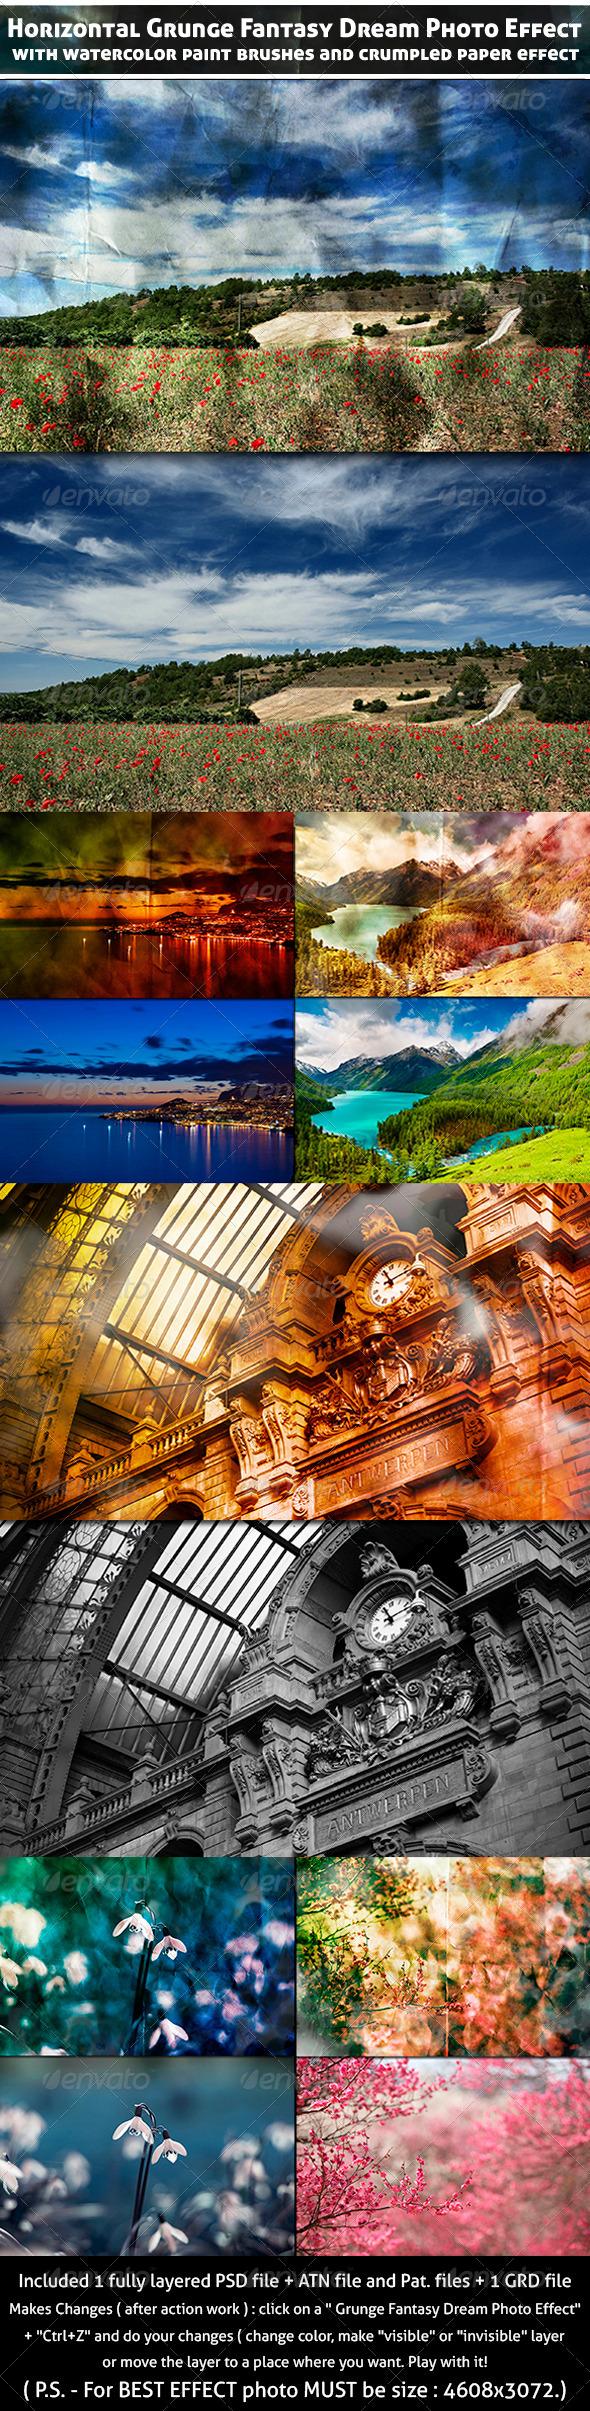 Horizontal Grunge Fantasy Dream Photo Effect - Actions Photoshop